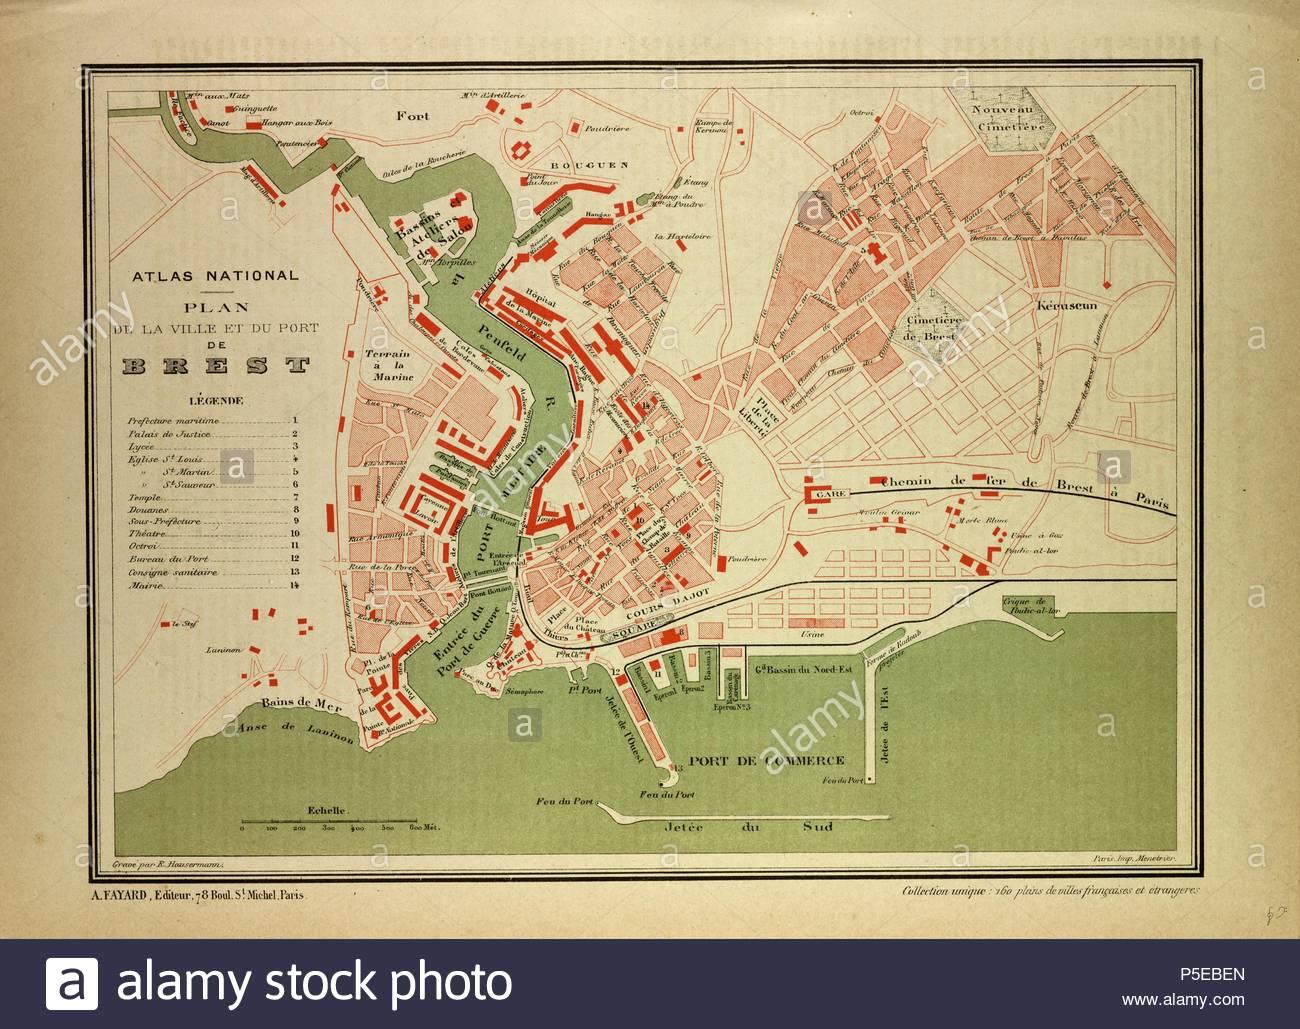 Map Of Brest France Stockfotos & Map Of Brest France Bilder - Alamy